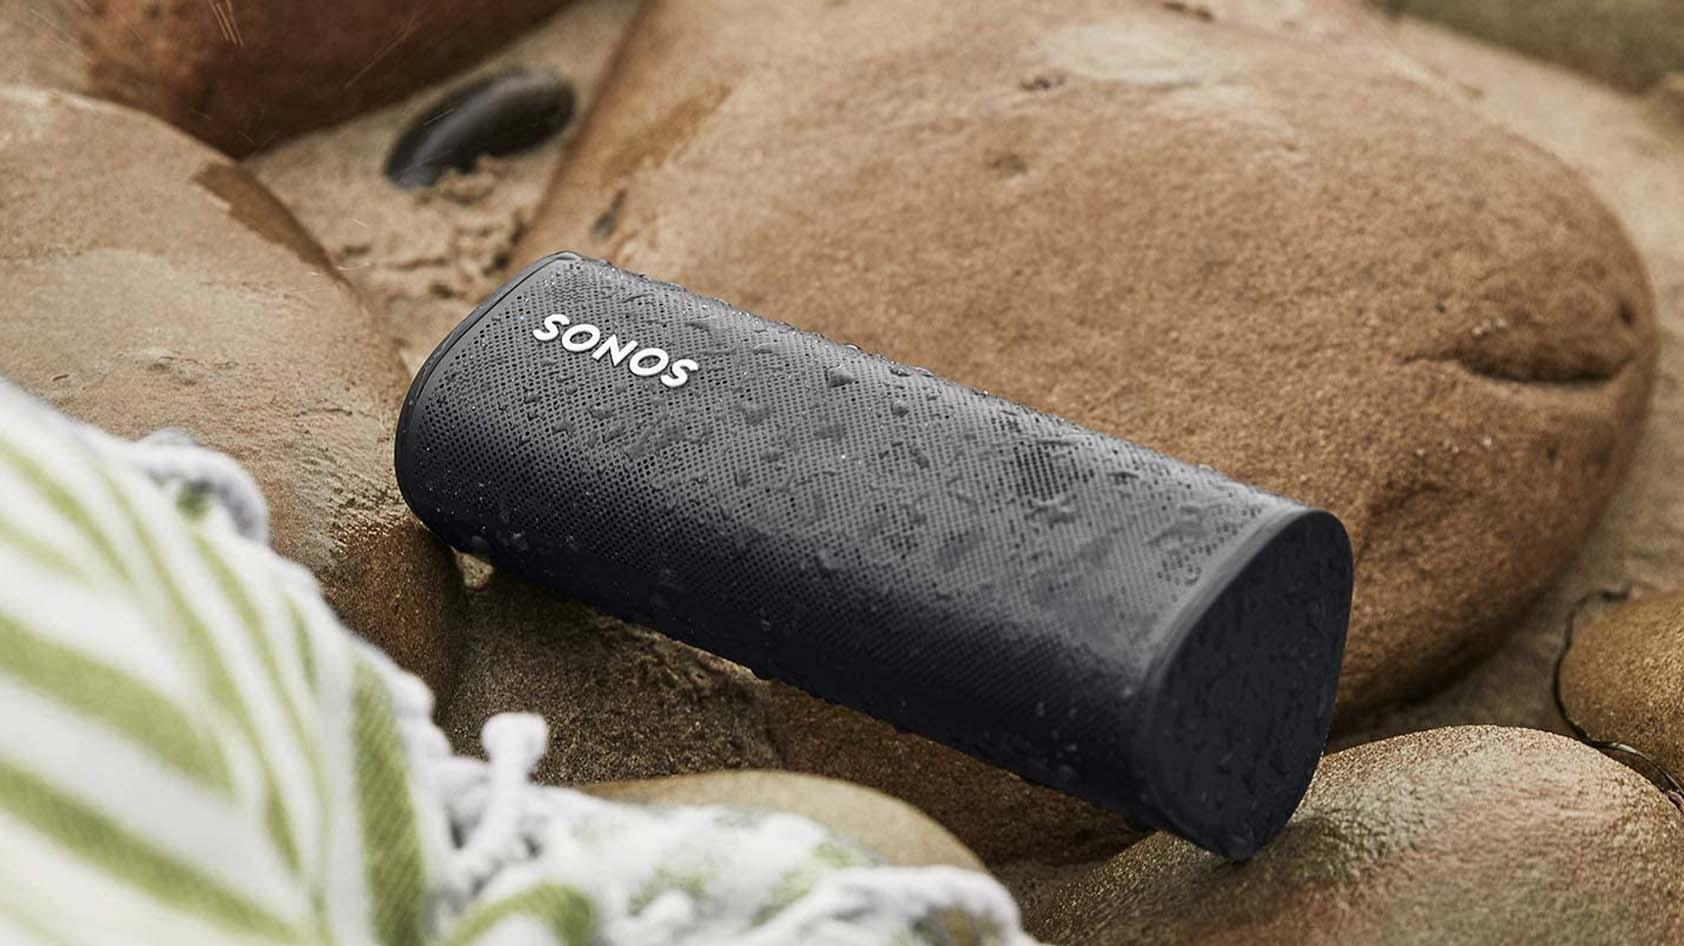 Sonos Roam product image 1